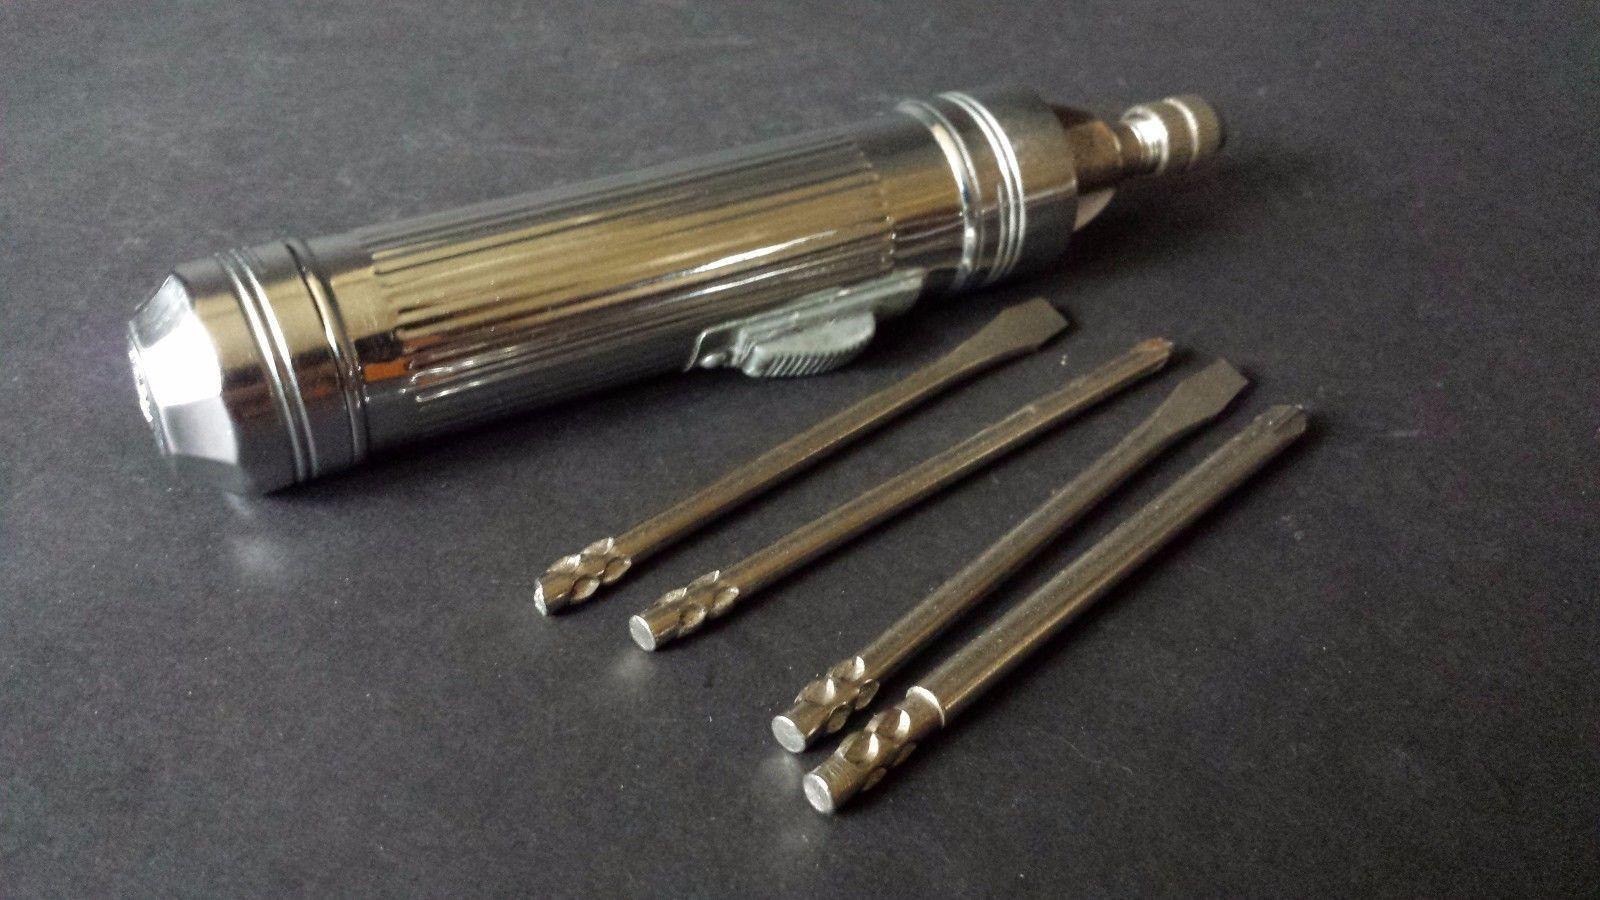 Vtg Apex Screwdriver and Bit Set Metal Handle